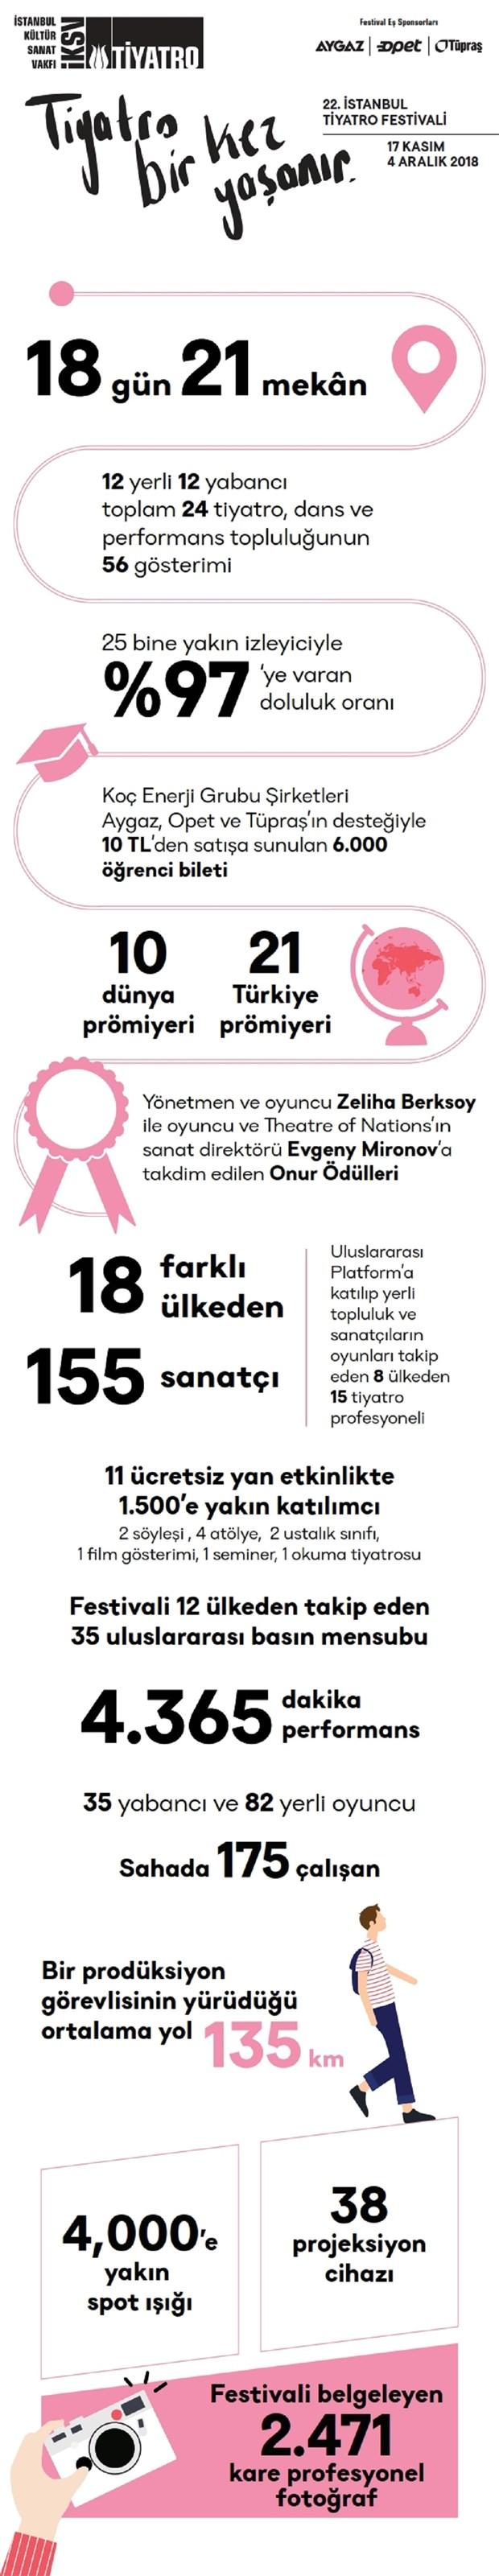 22-istanbul-tiyatro-festivali-sona-erdi-539451-1.